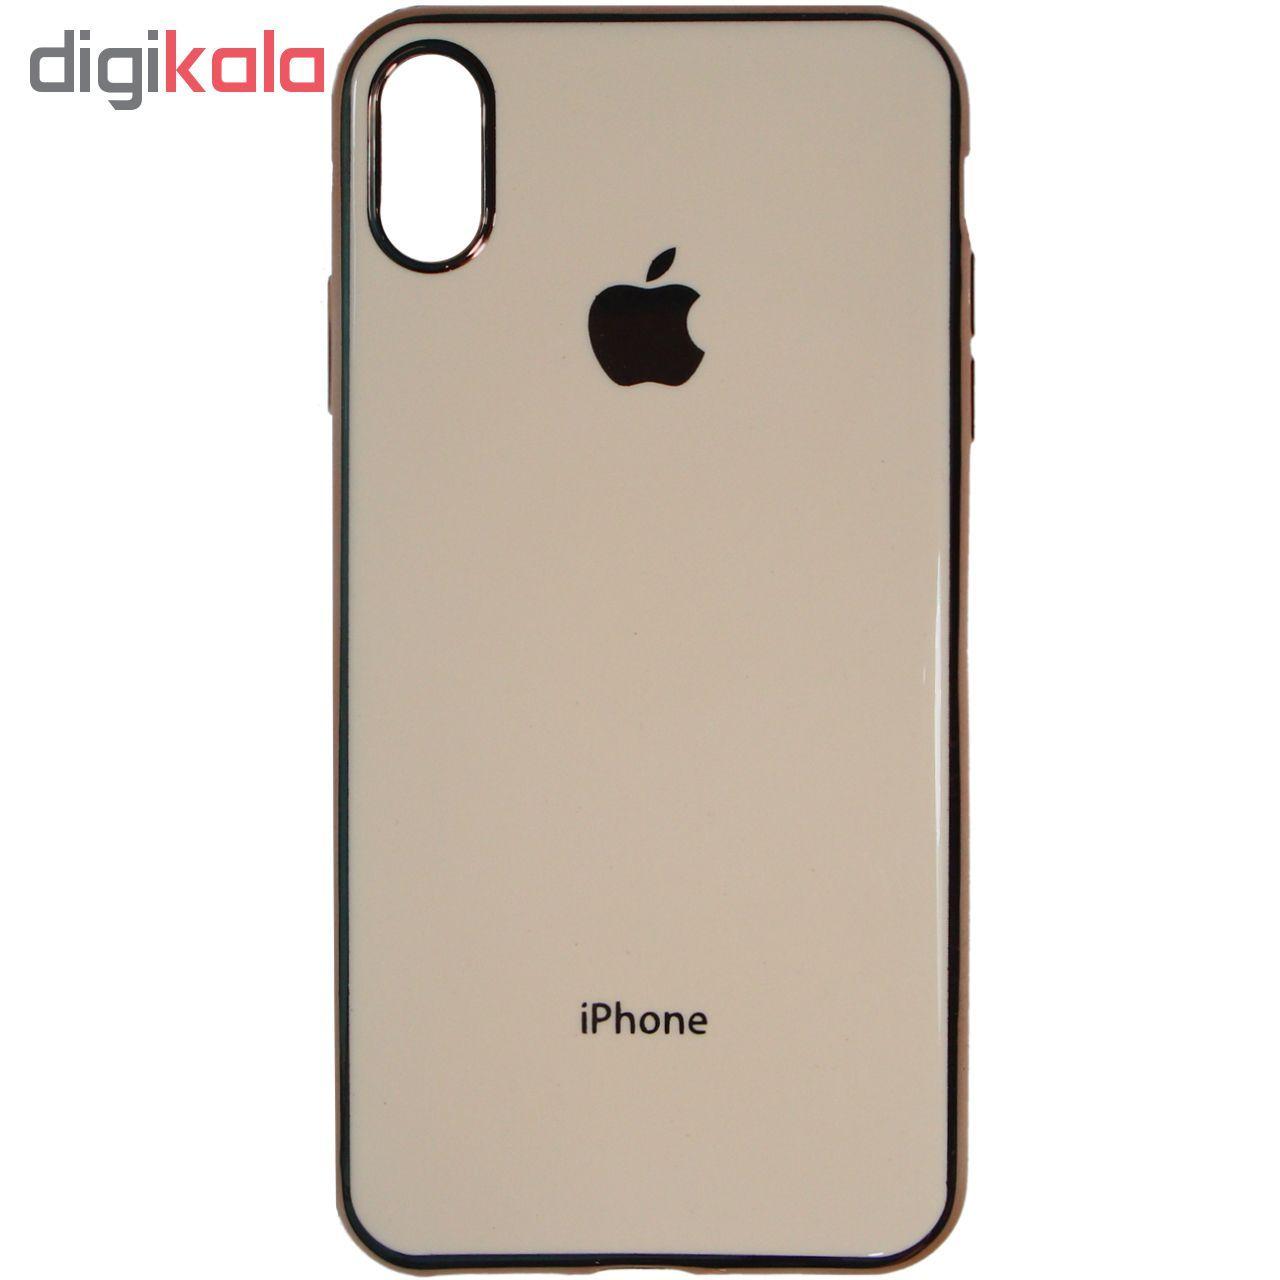 کاور  مدل A0 مناسب برای گوشی موبایل اپل iphone xs max main 1 1